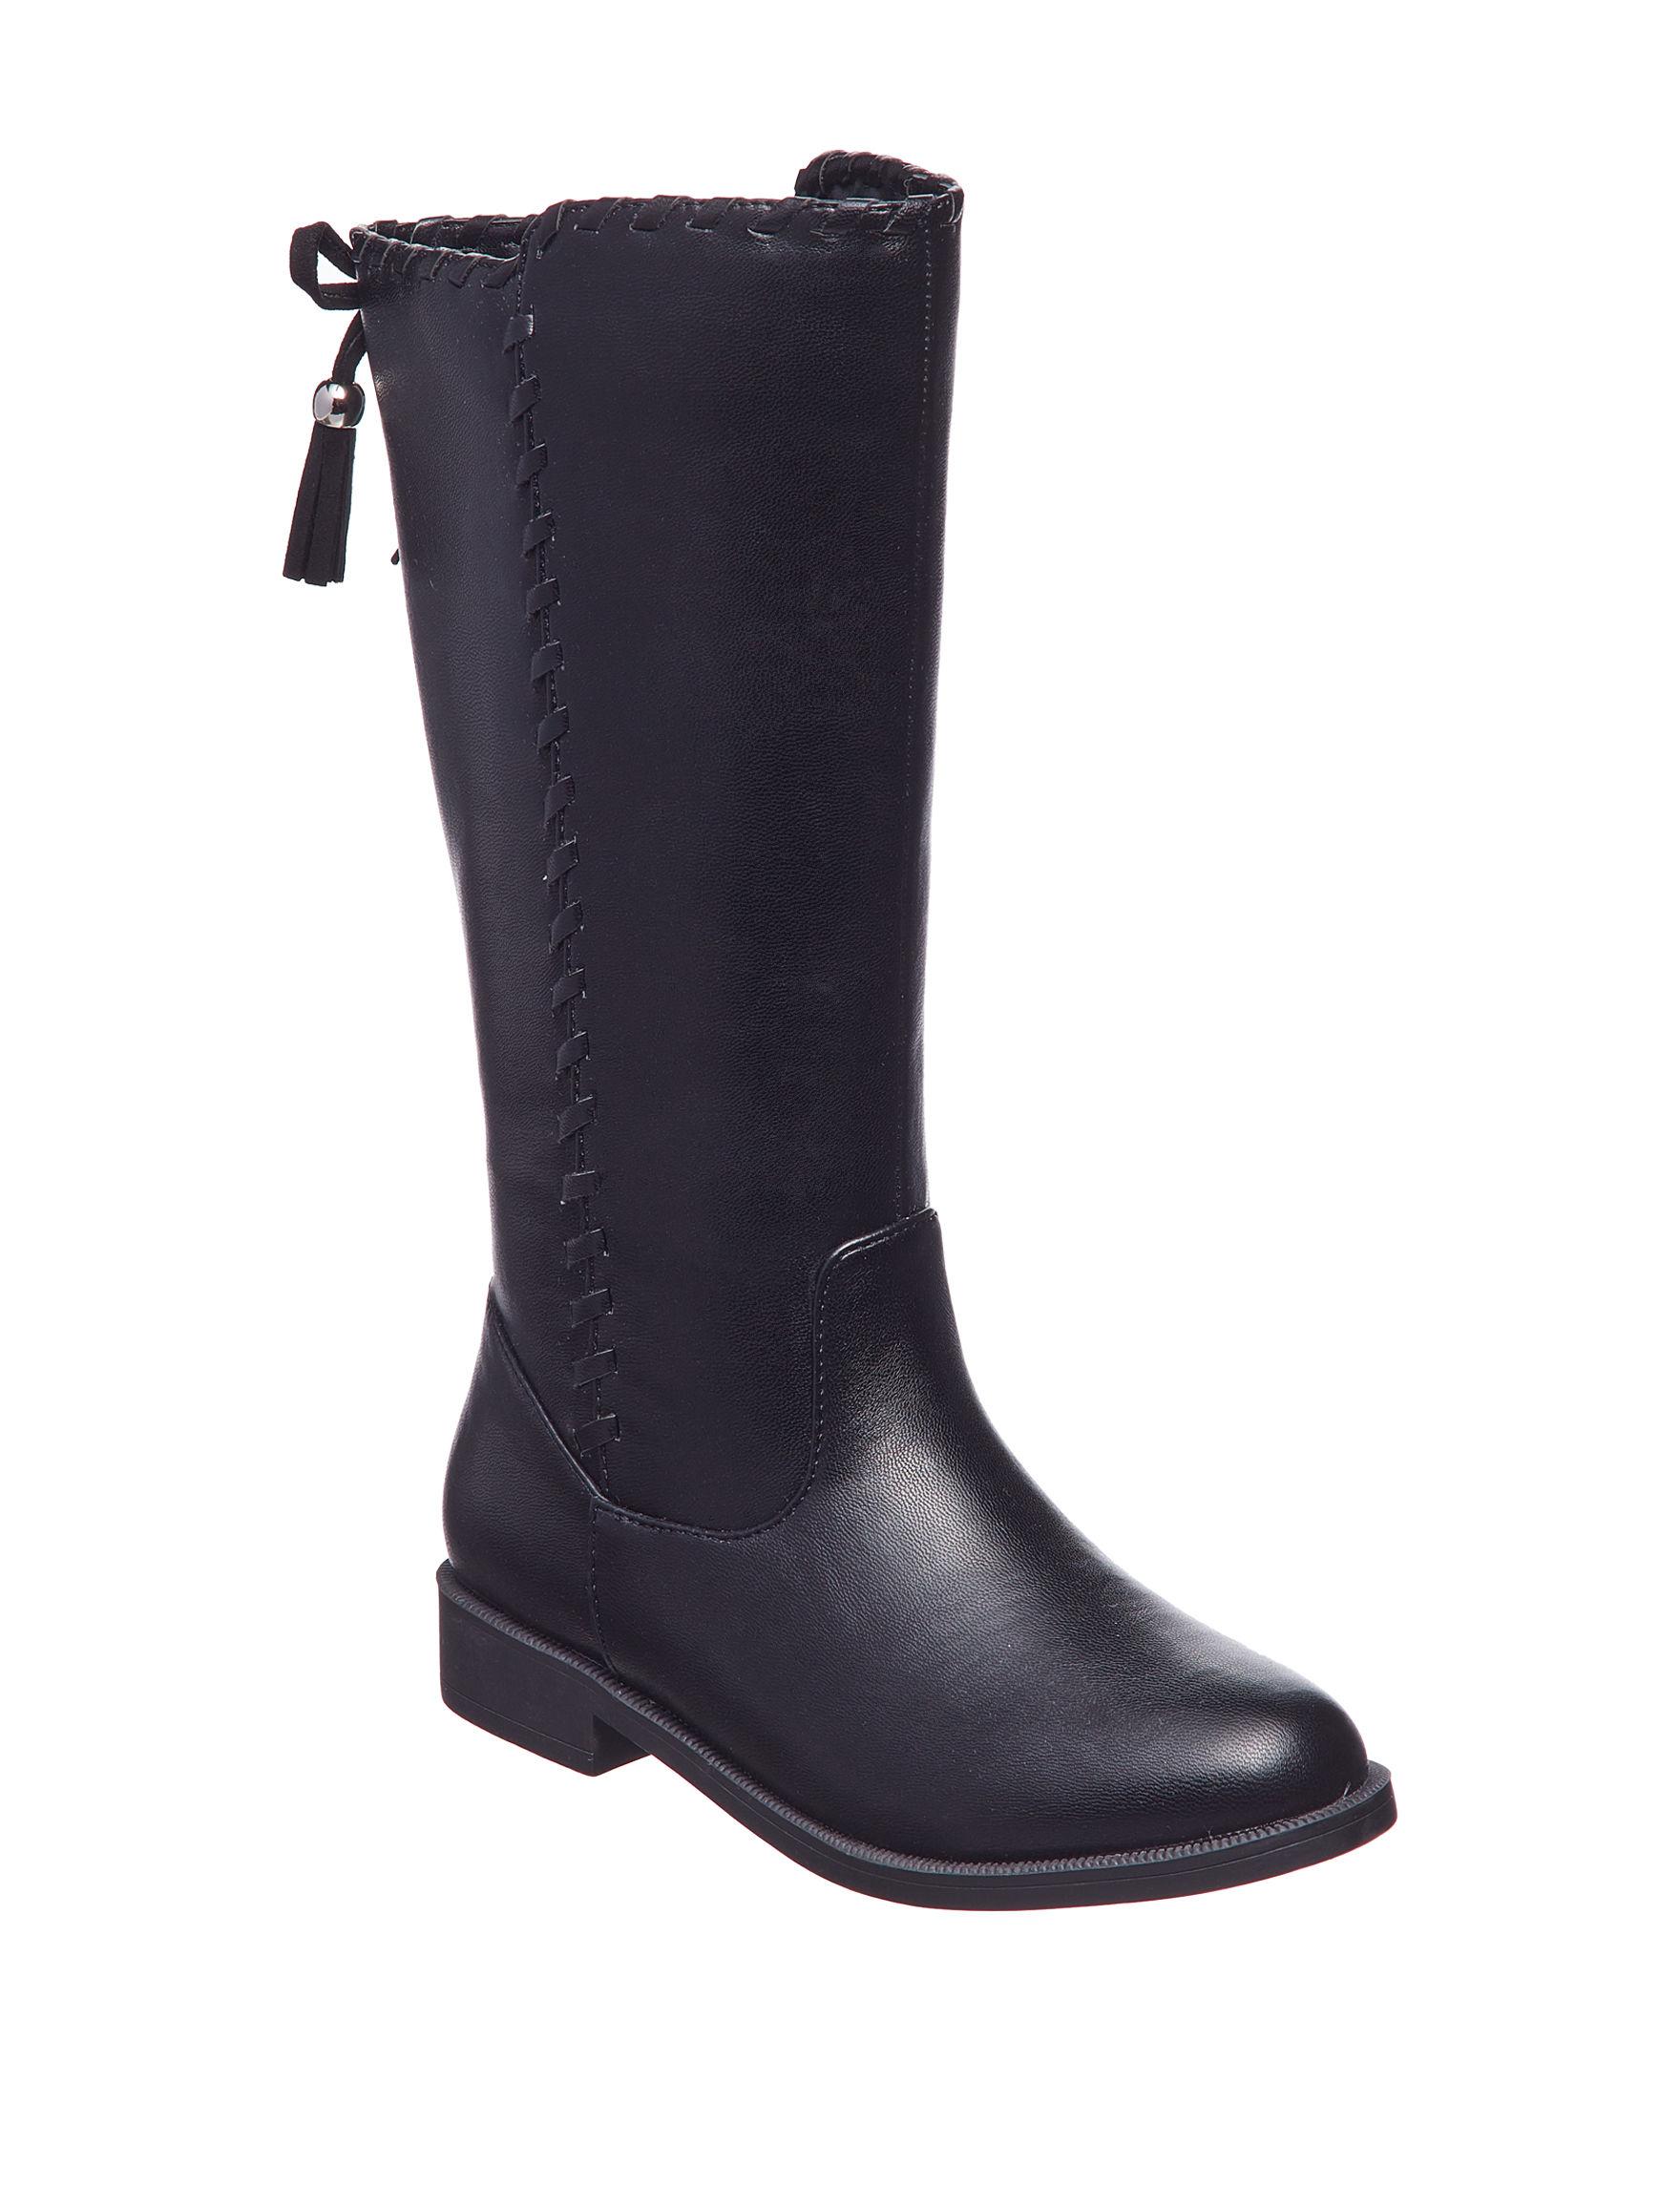 Sugar Black Riding Boots